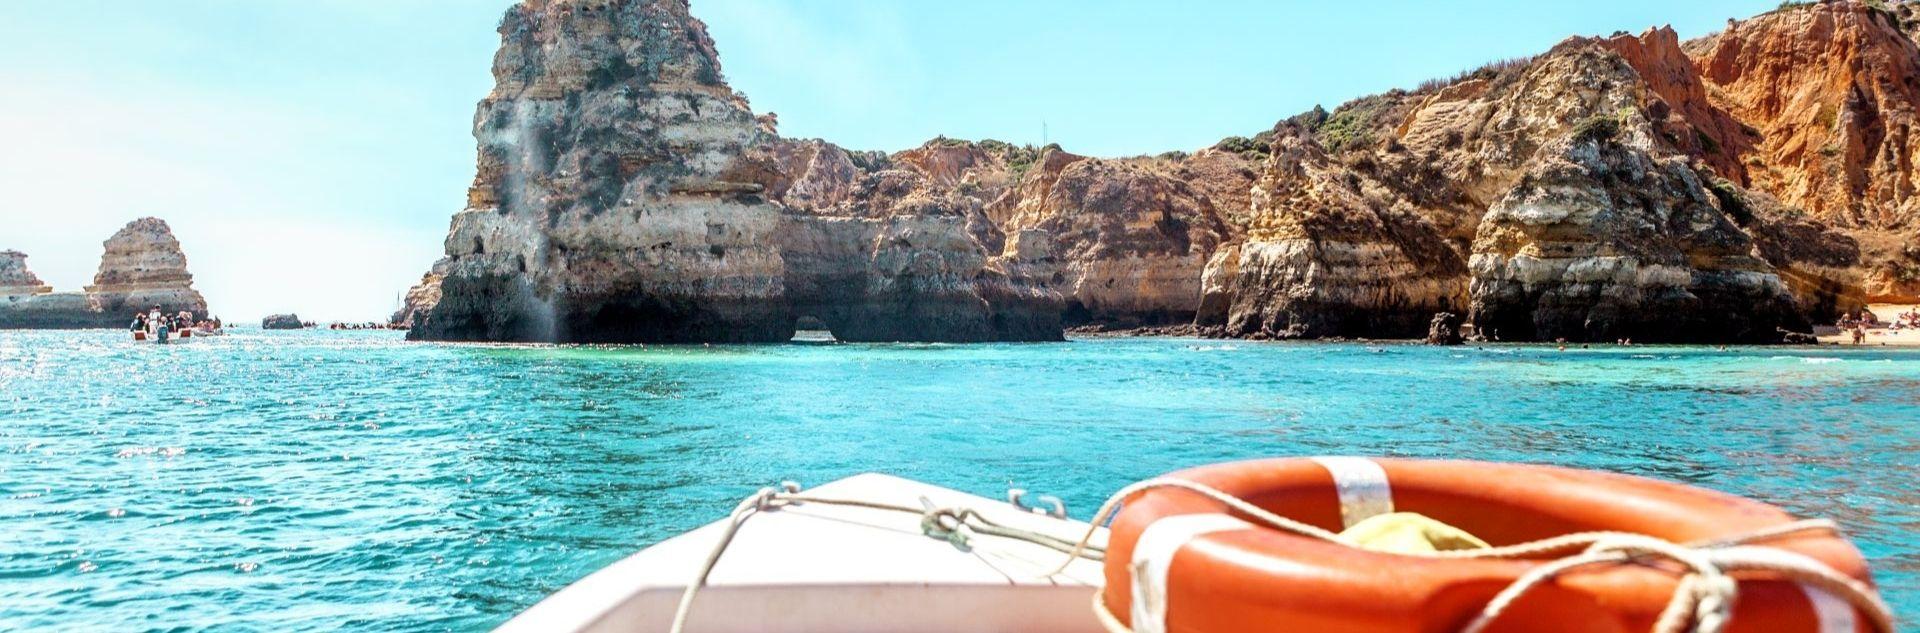 Reiseziel Portugal - Boot